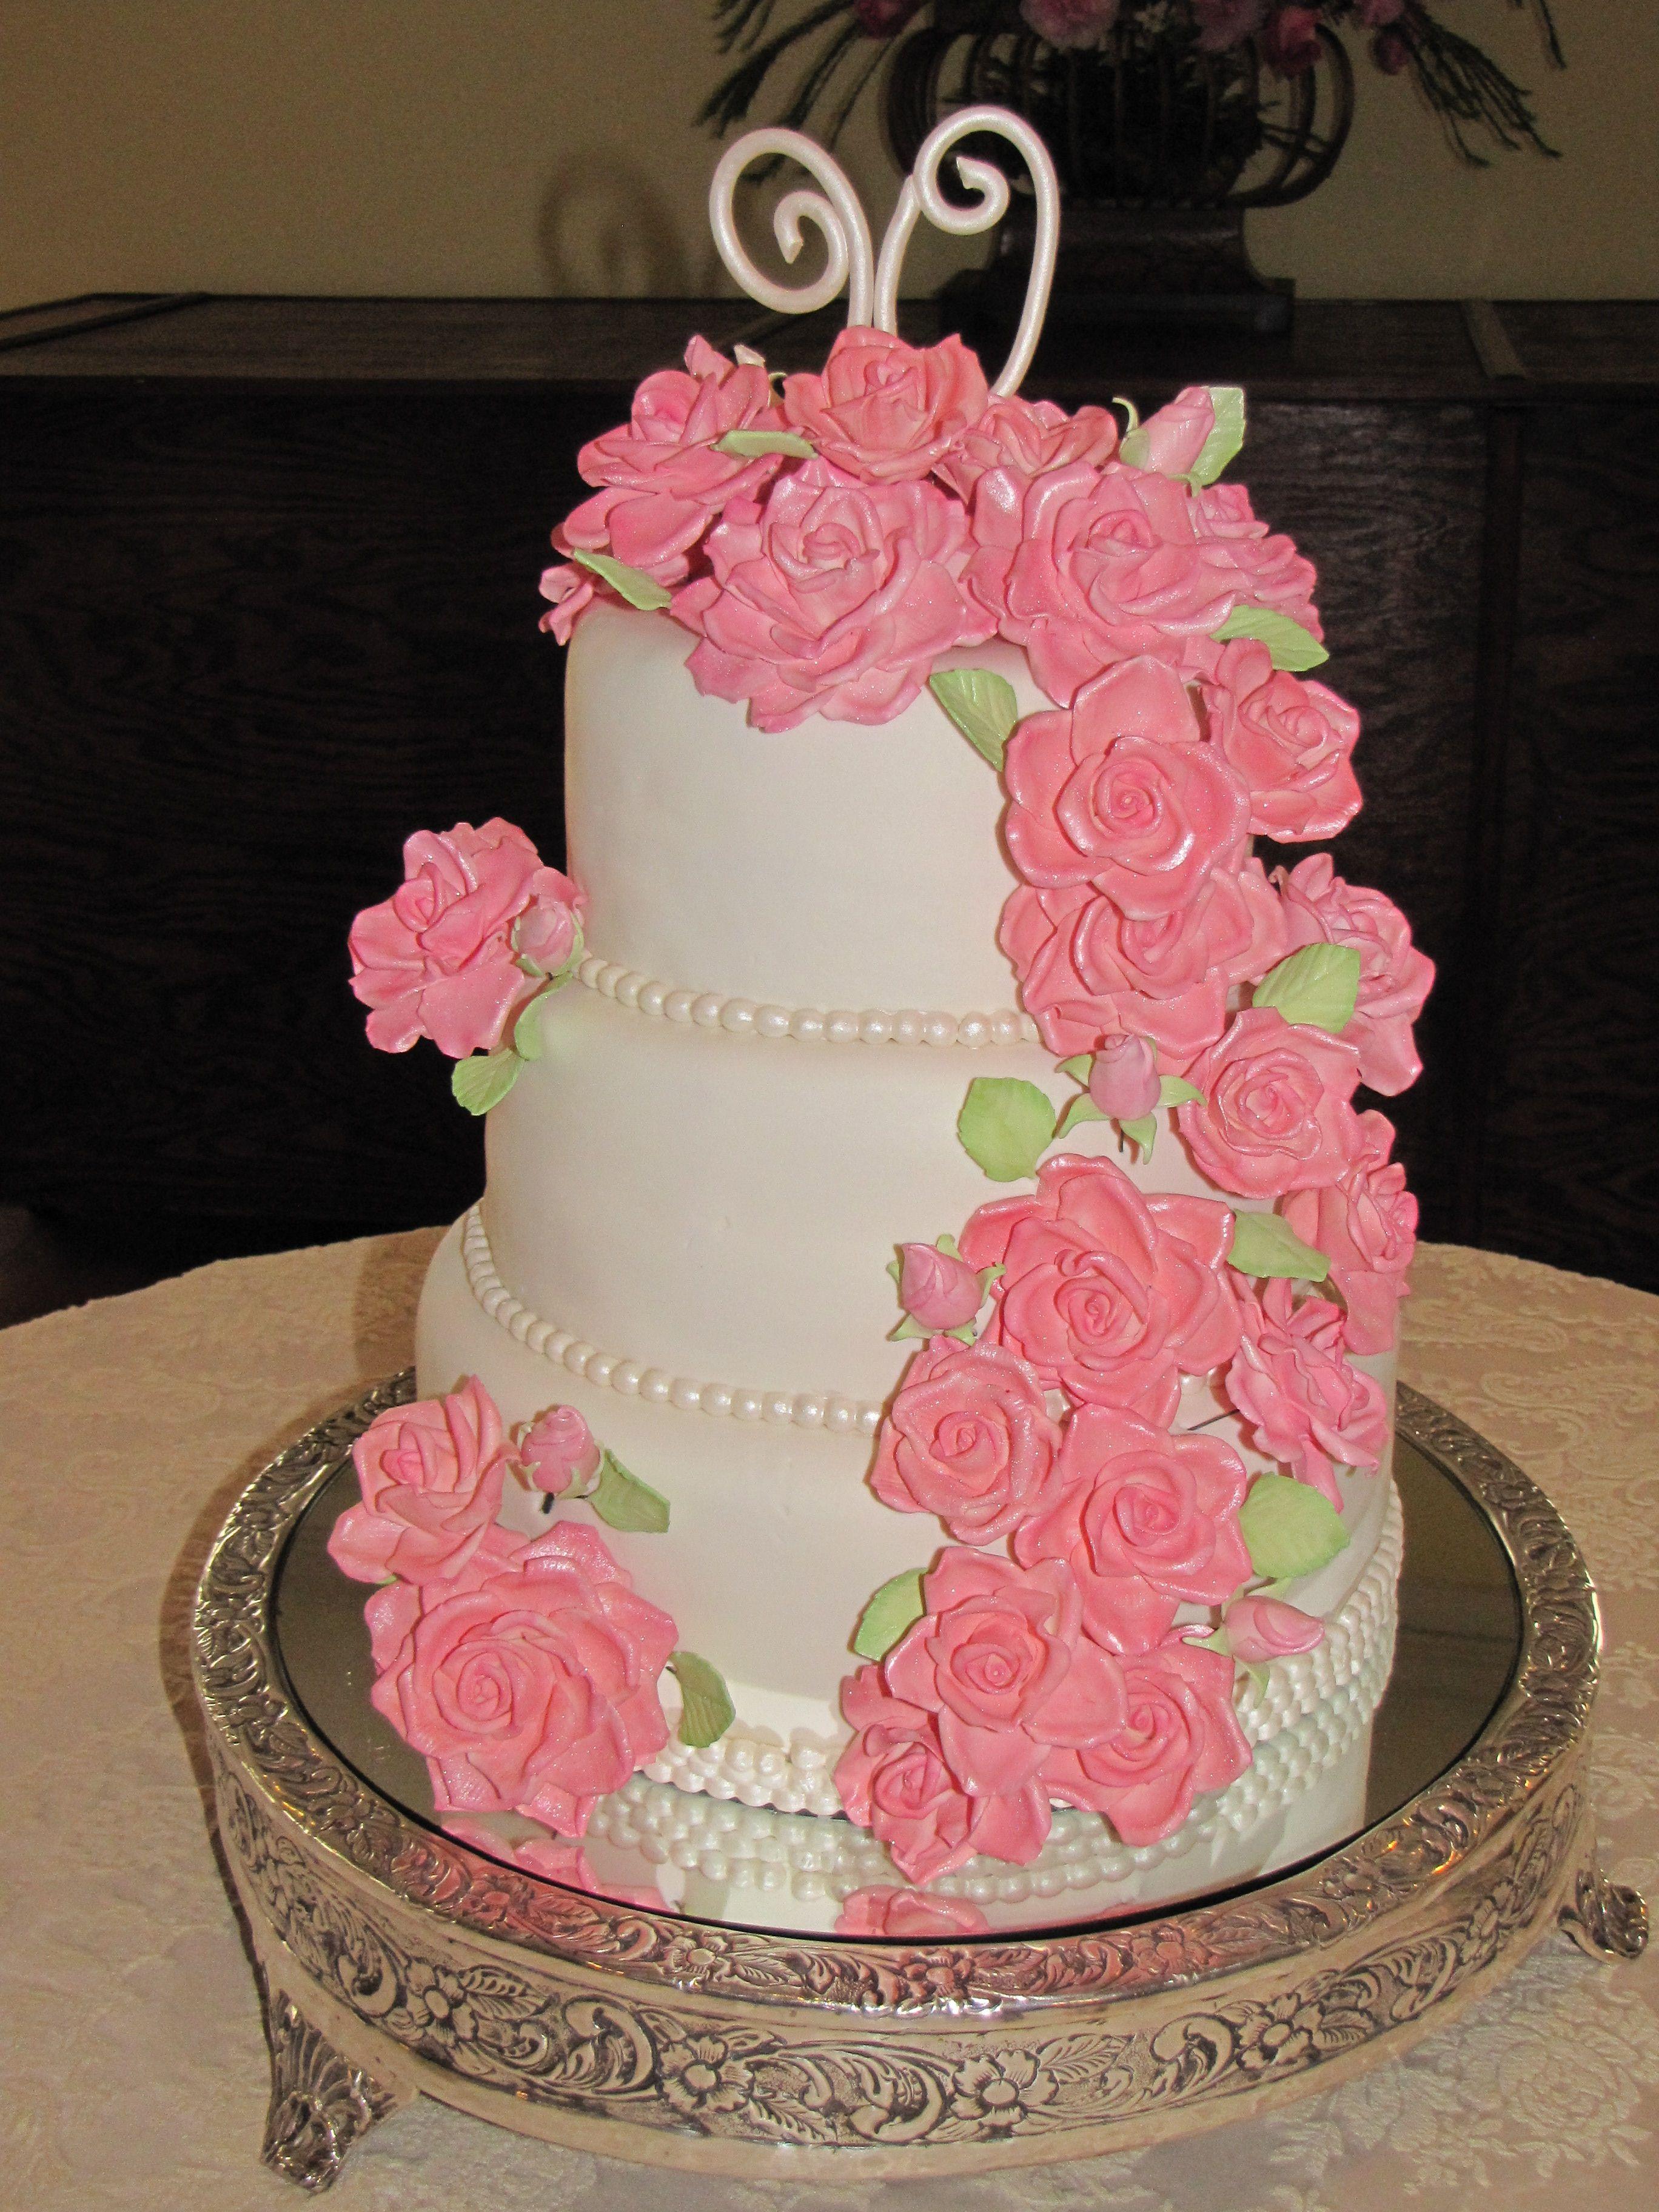 Birthday cake photos 90th birthday cake 90th